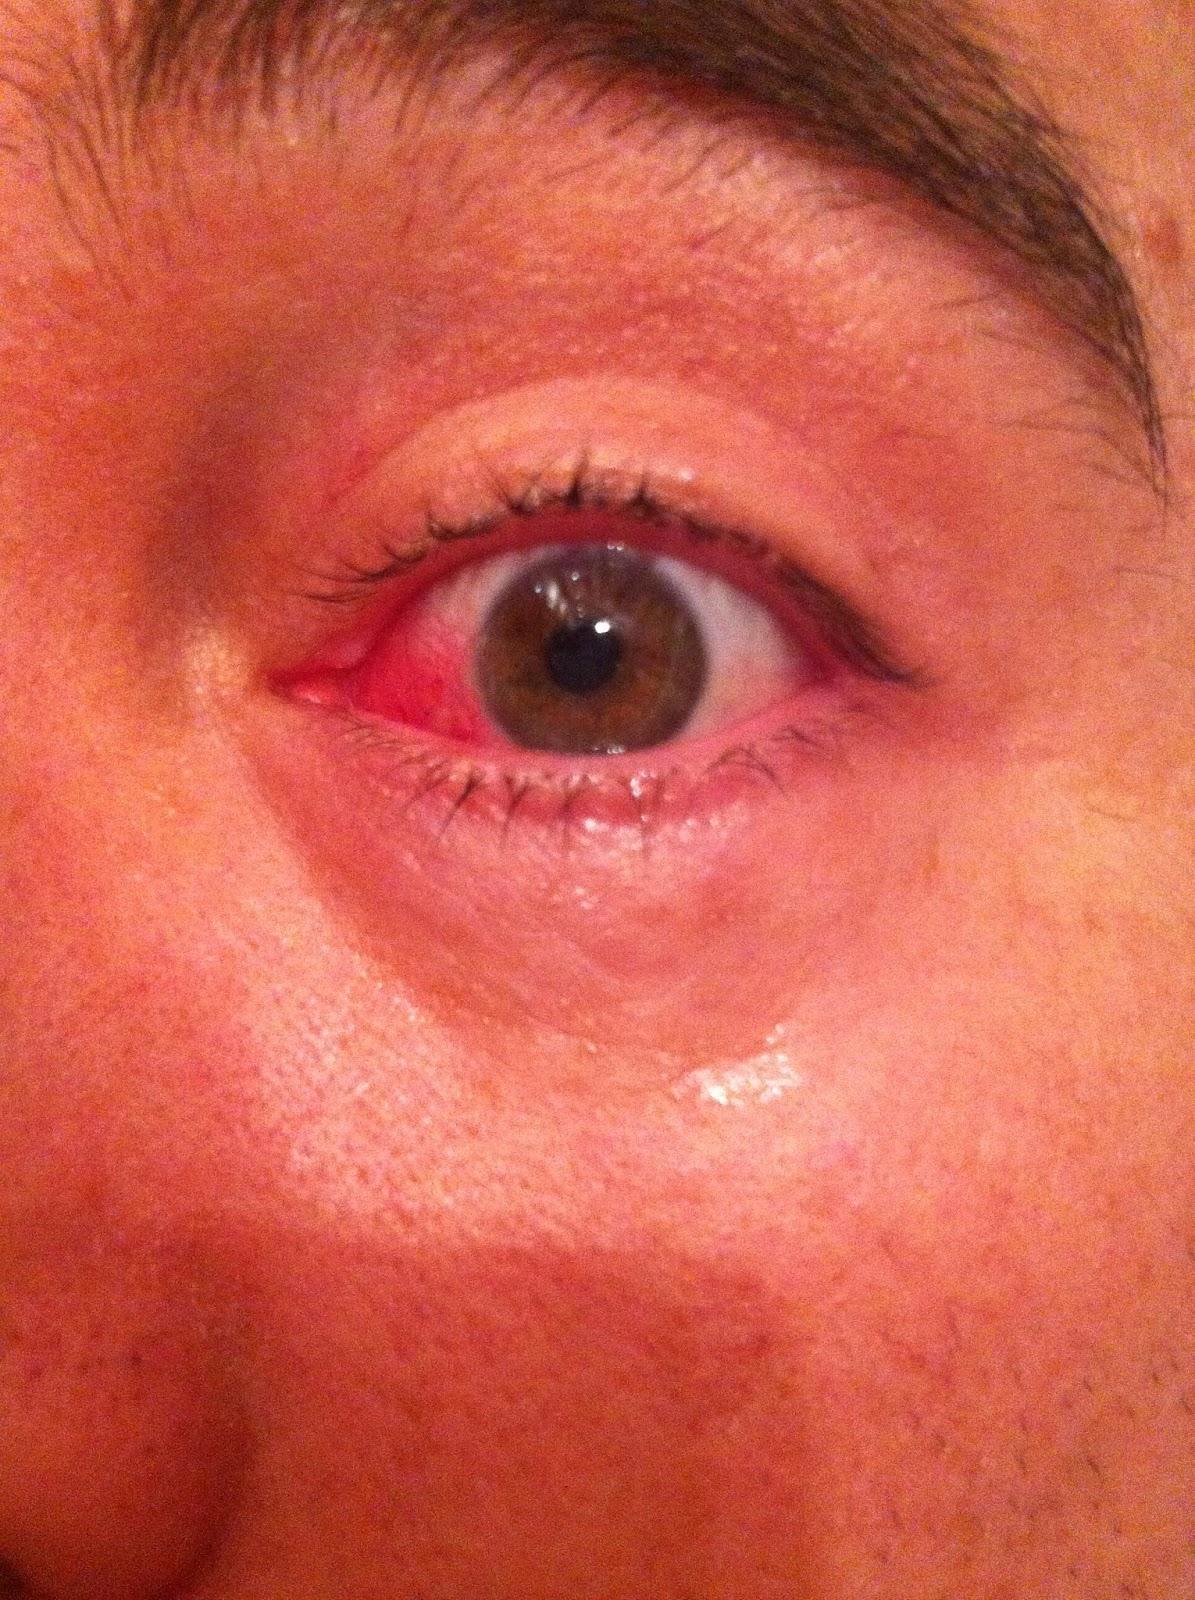 Pterygium eye surgery